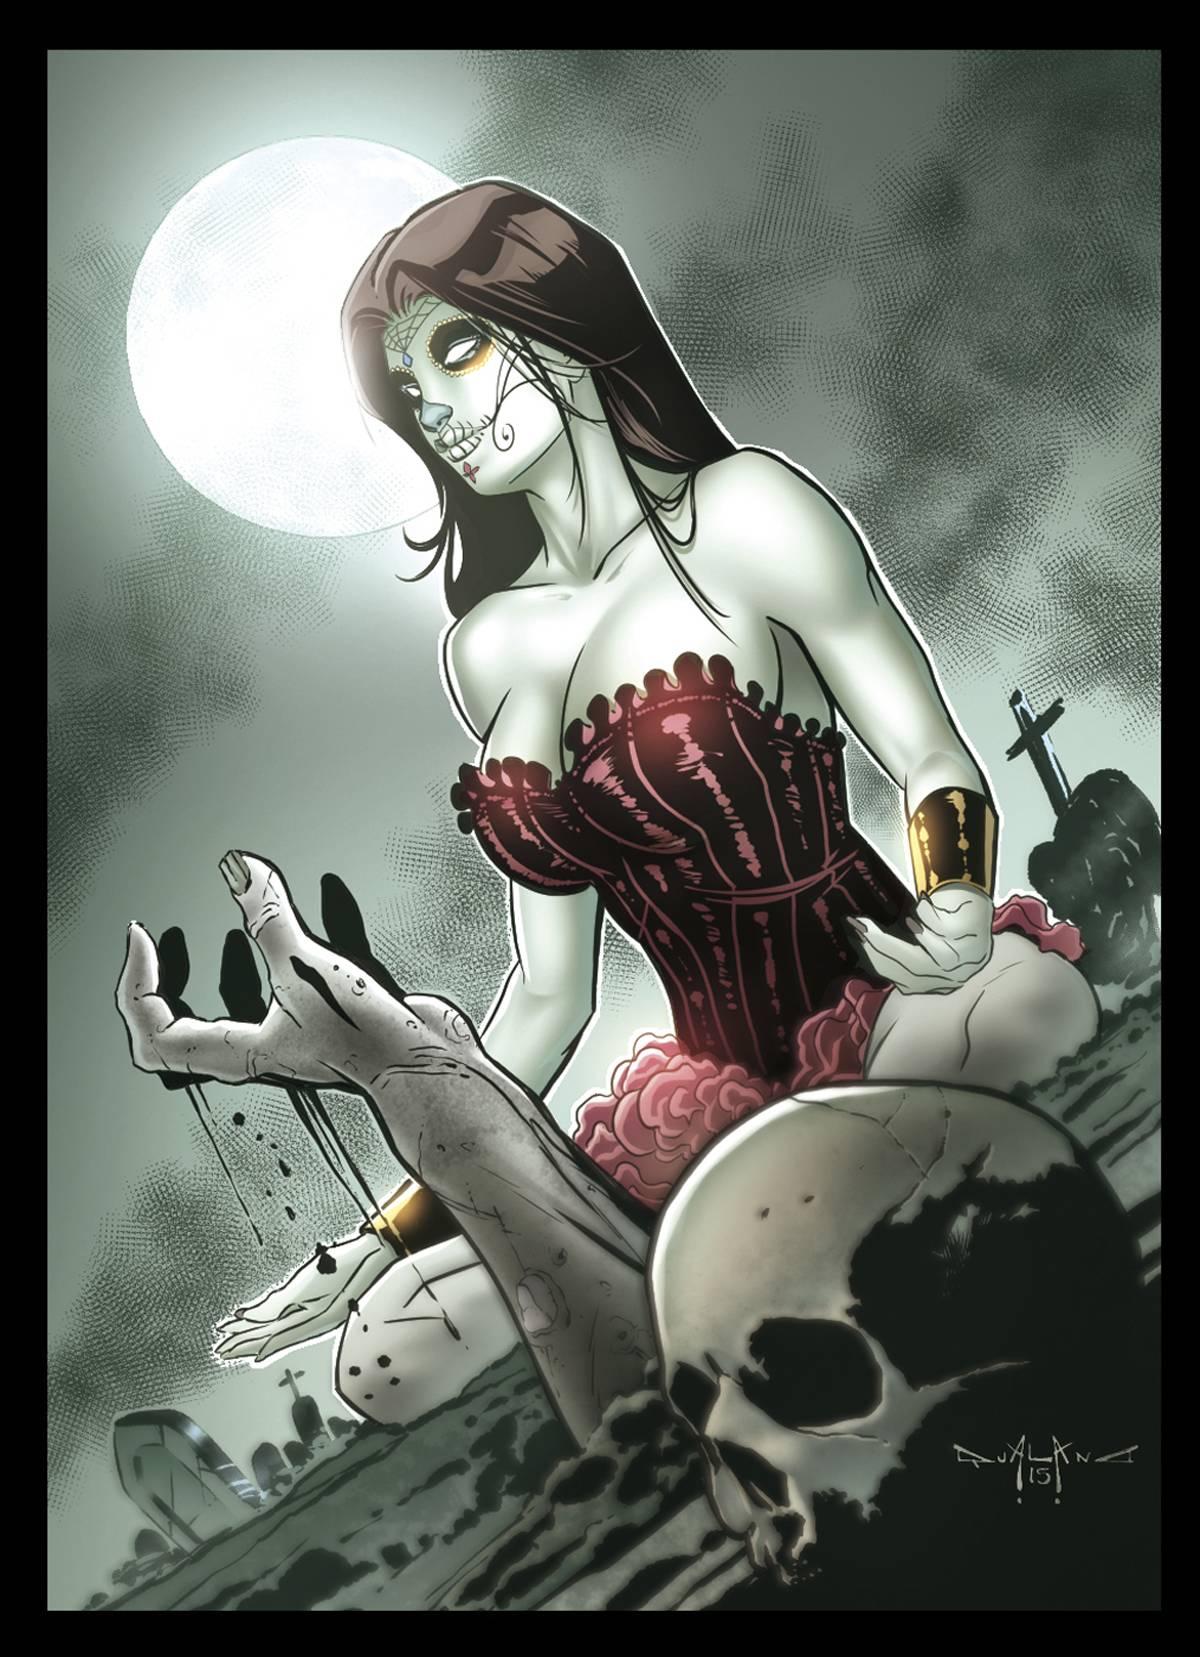 Pin on cool comic book covers